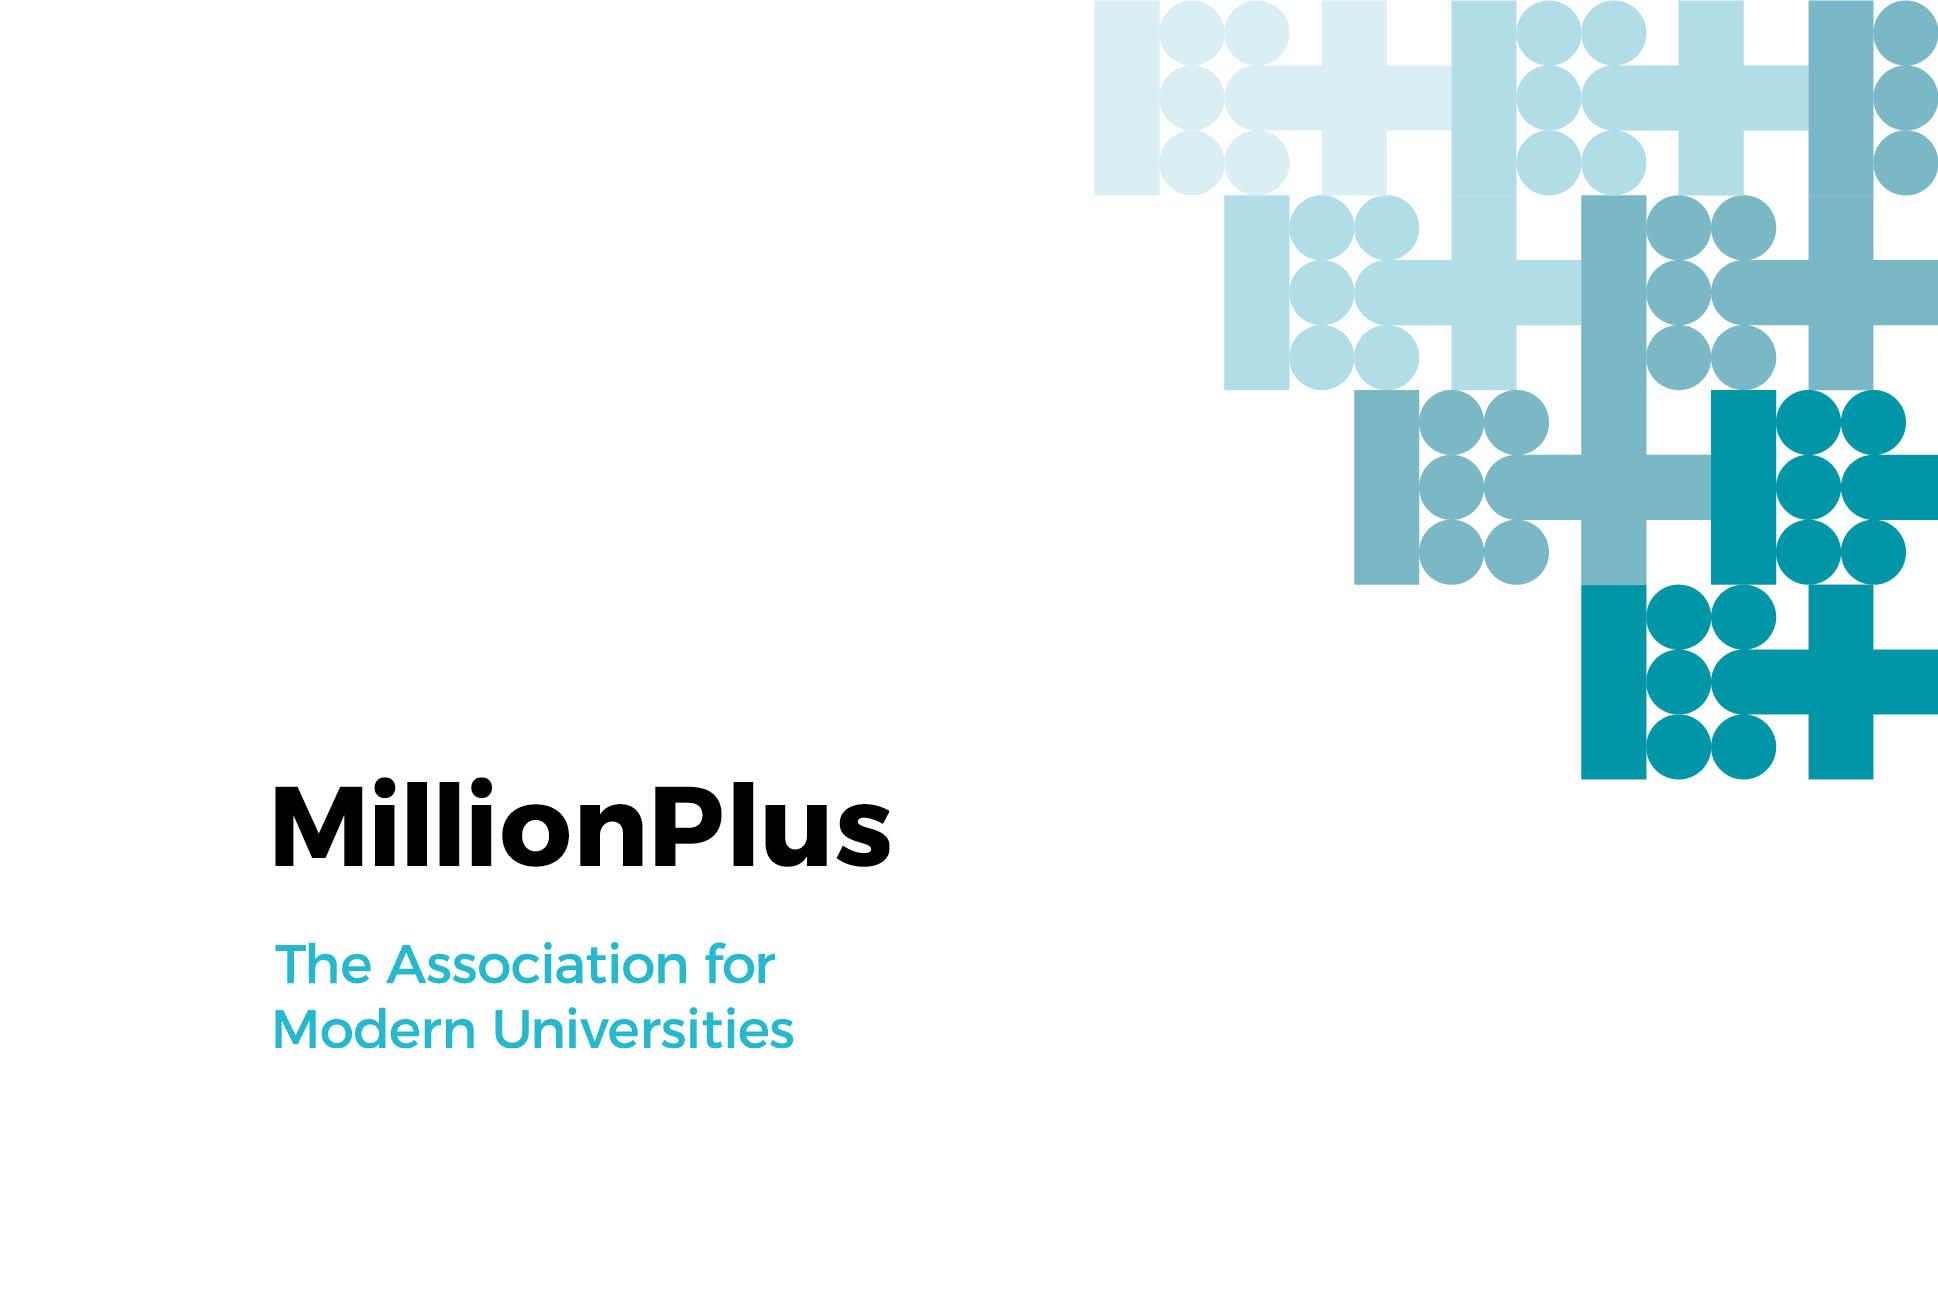 MillionPlus branding   Education Branding London   Independent Marketing London   IM London